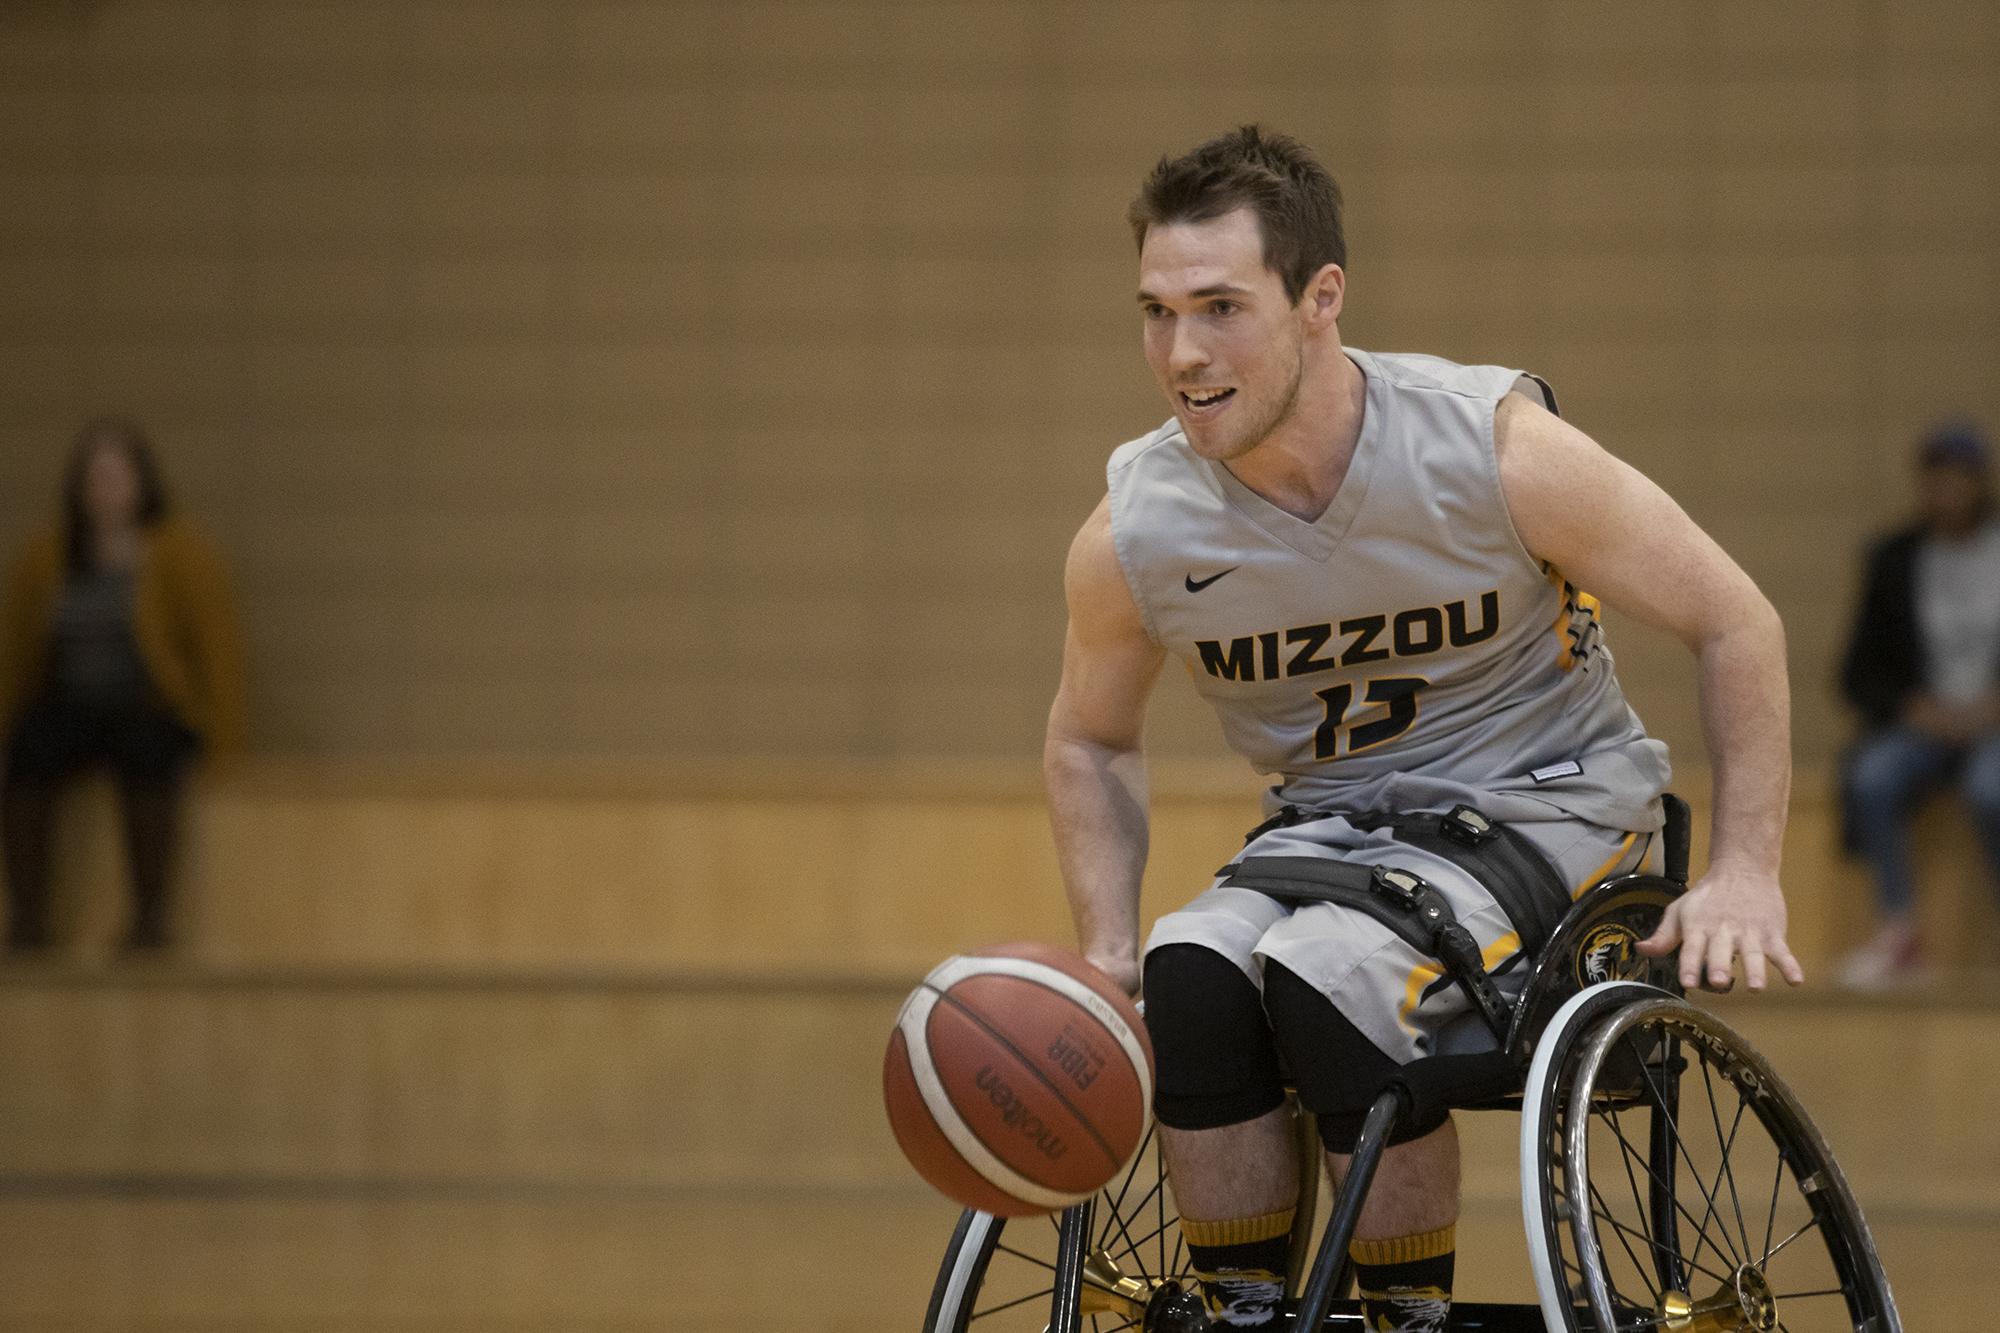 man playing wheelchair basketball